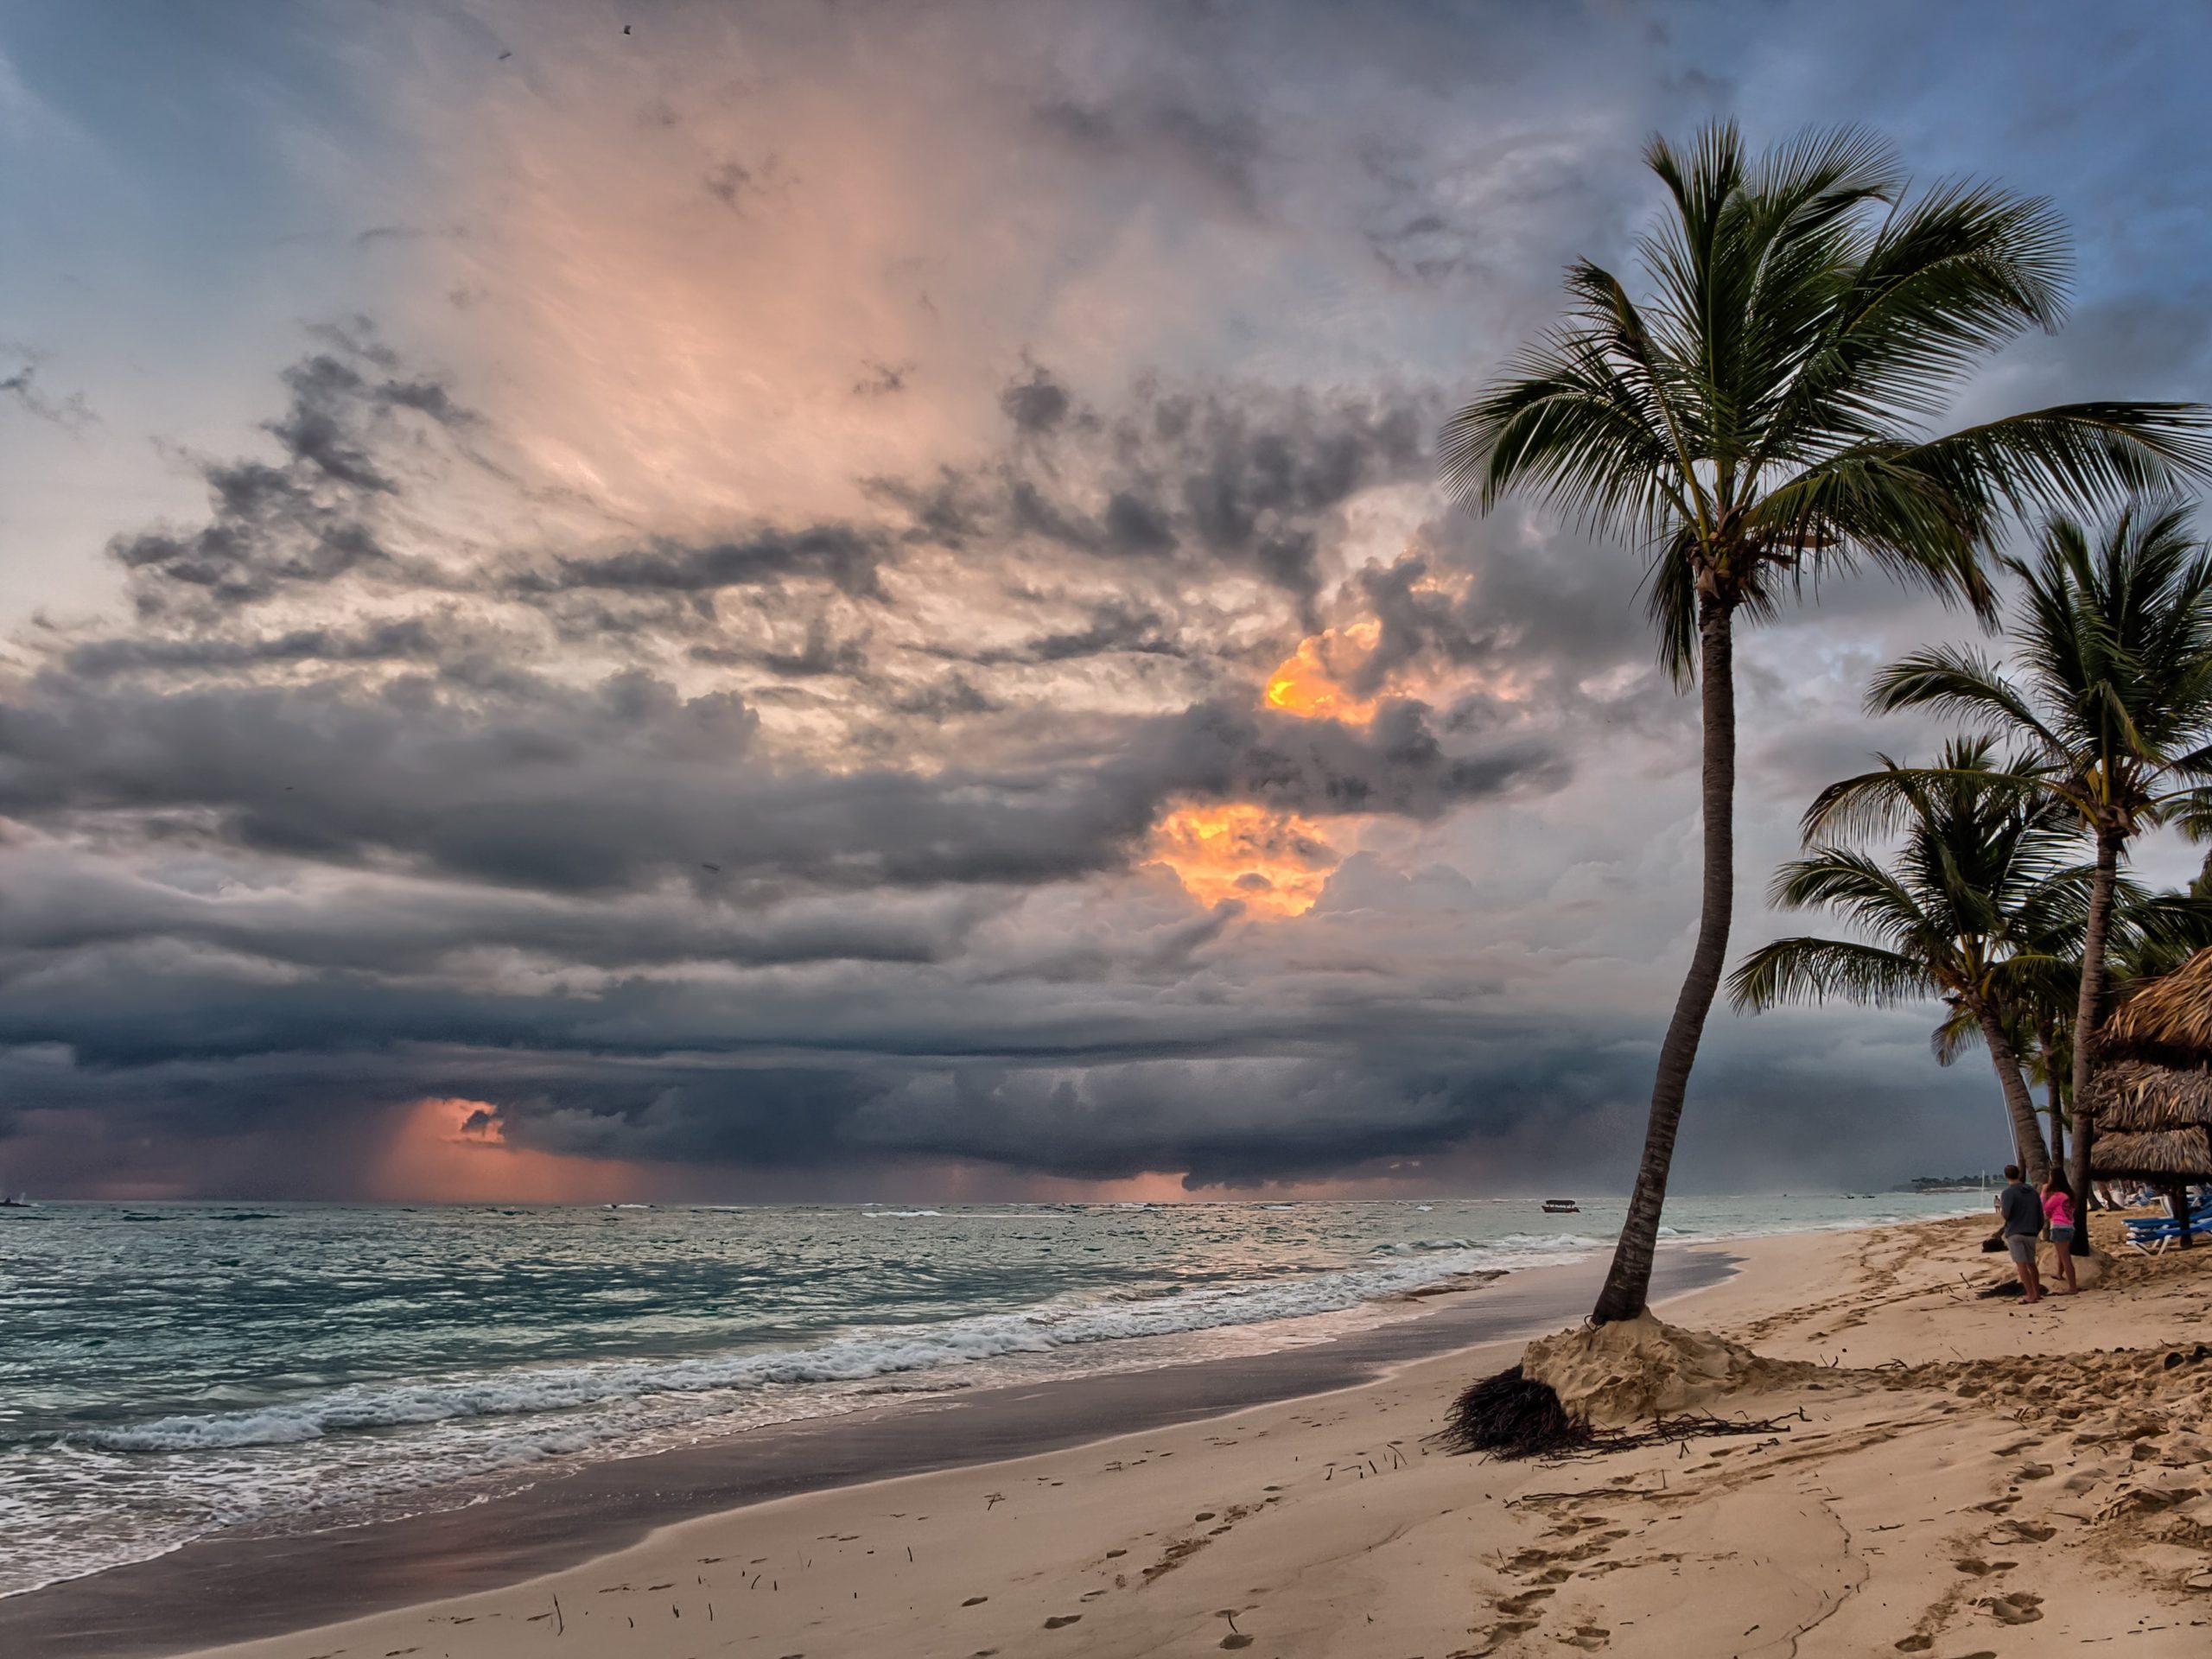 Hurricanes and Hurricane Season, In A Nutshell